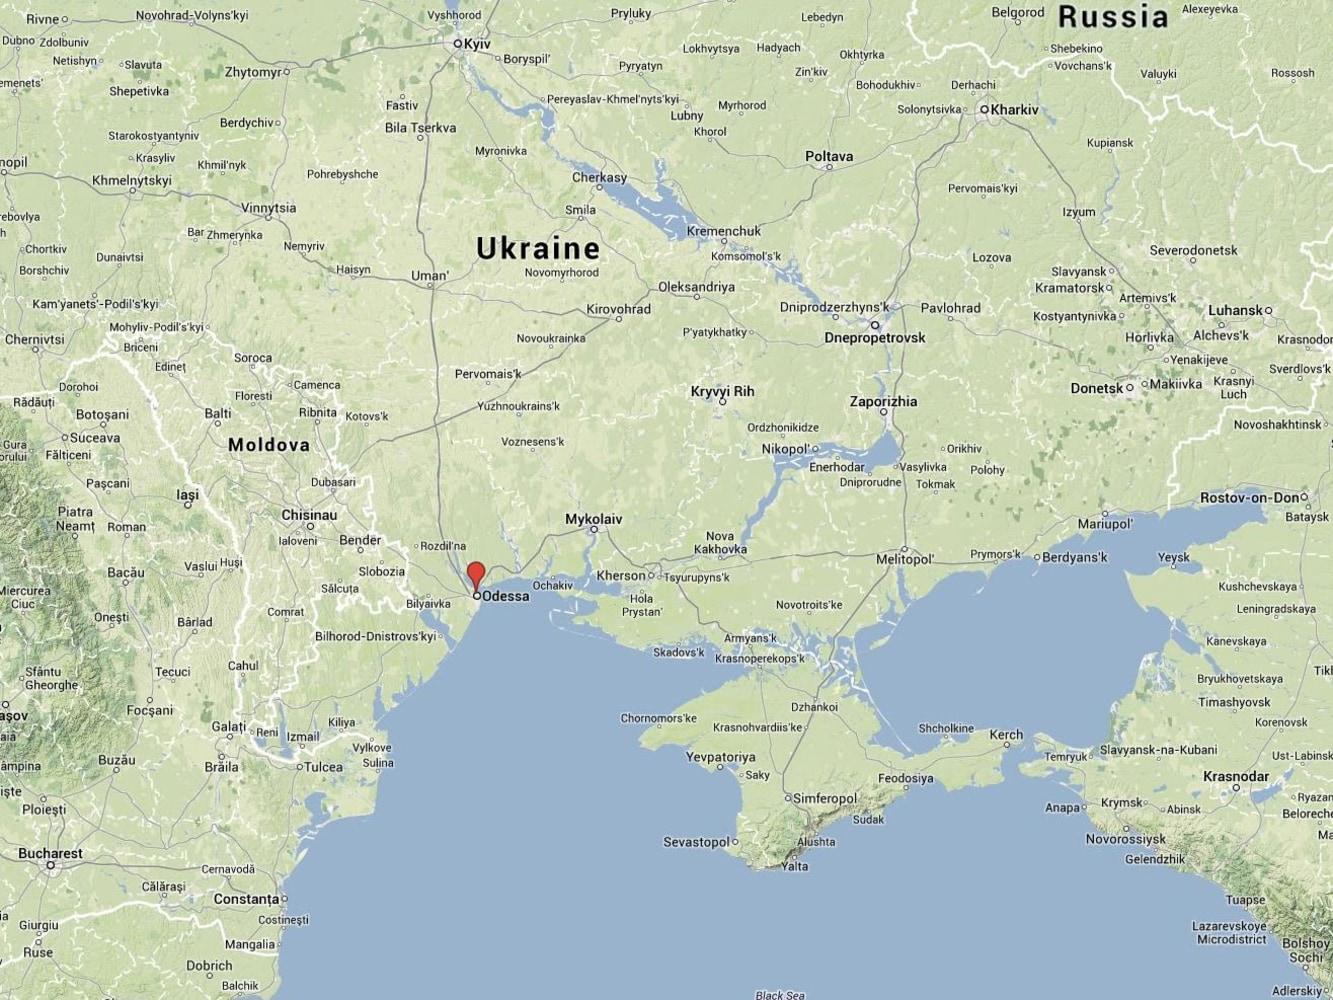 world map cities with Ukraine Conflict Creeps Crucial City Odessa N97391 on Khiva moreover Ukraine Conflict Creeps Crucial City Odessa N97391 furthermore 969 likewise Bangkok likewise 4697850234.